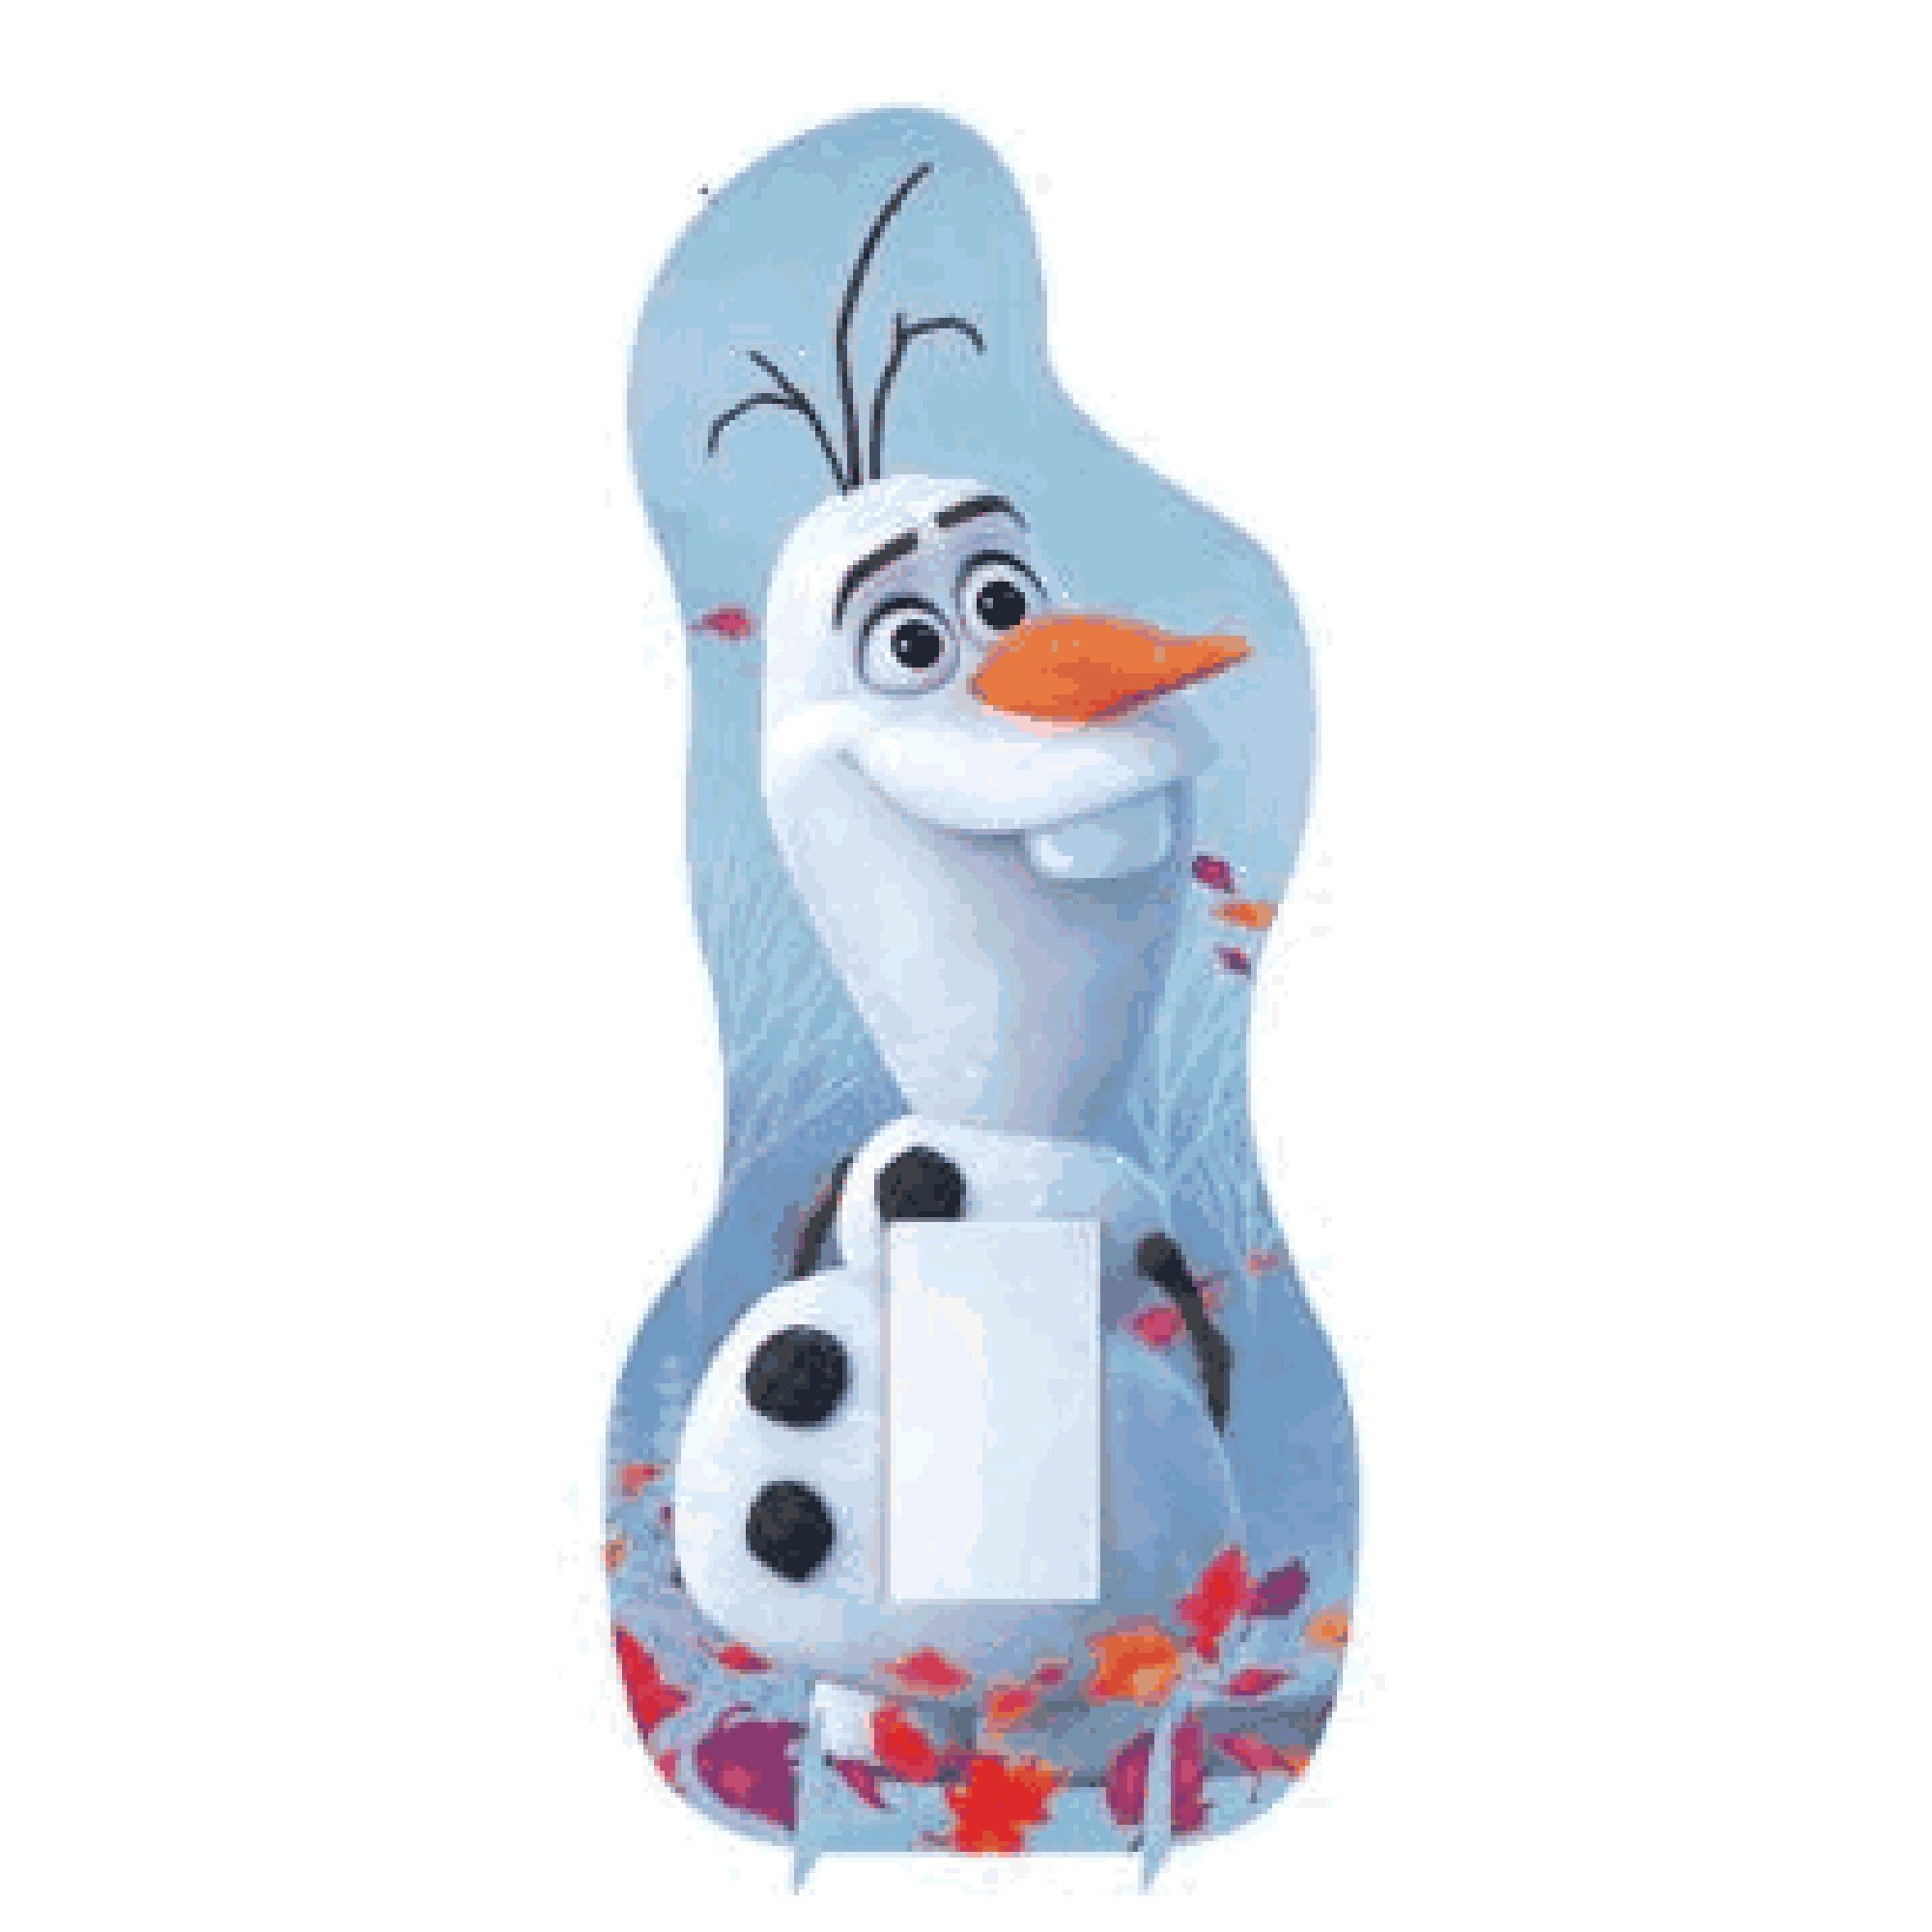 Frozen 2 Olaf Glitter Putty